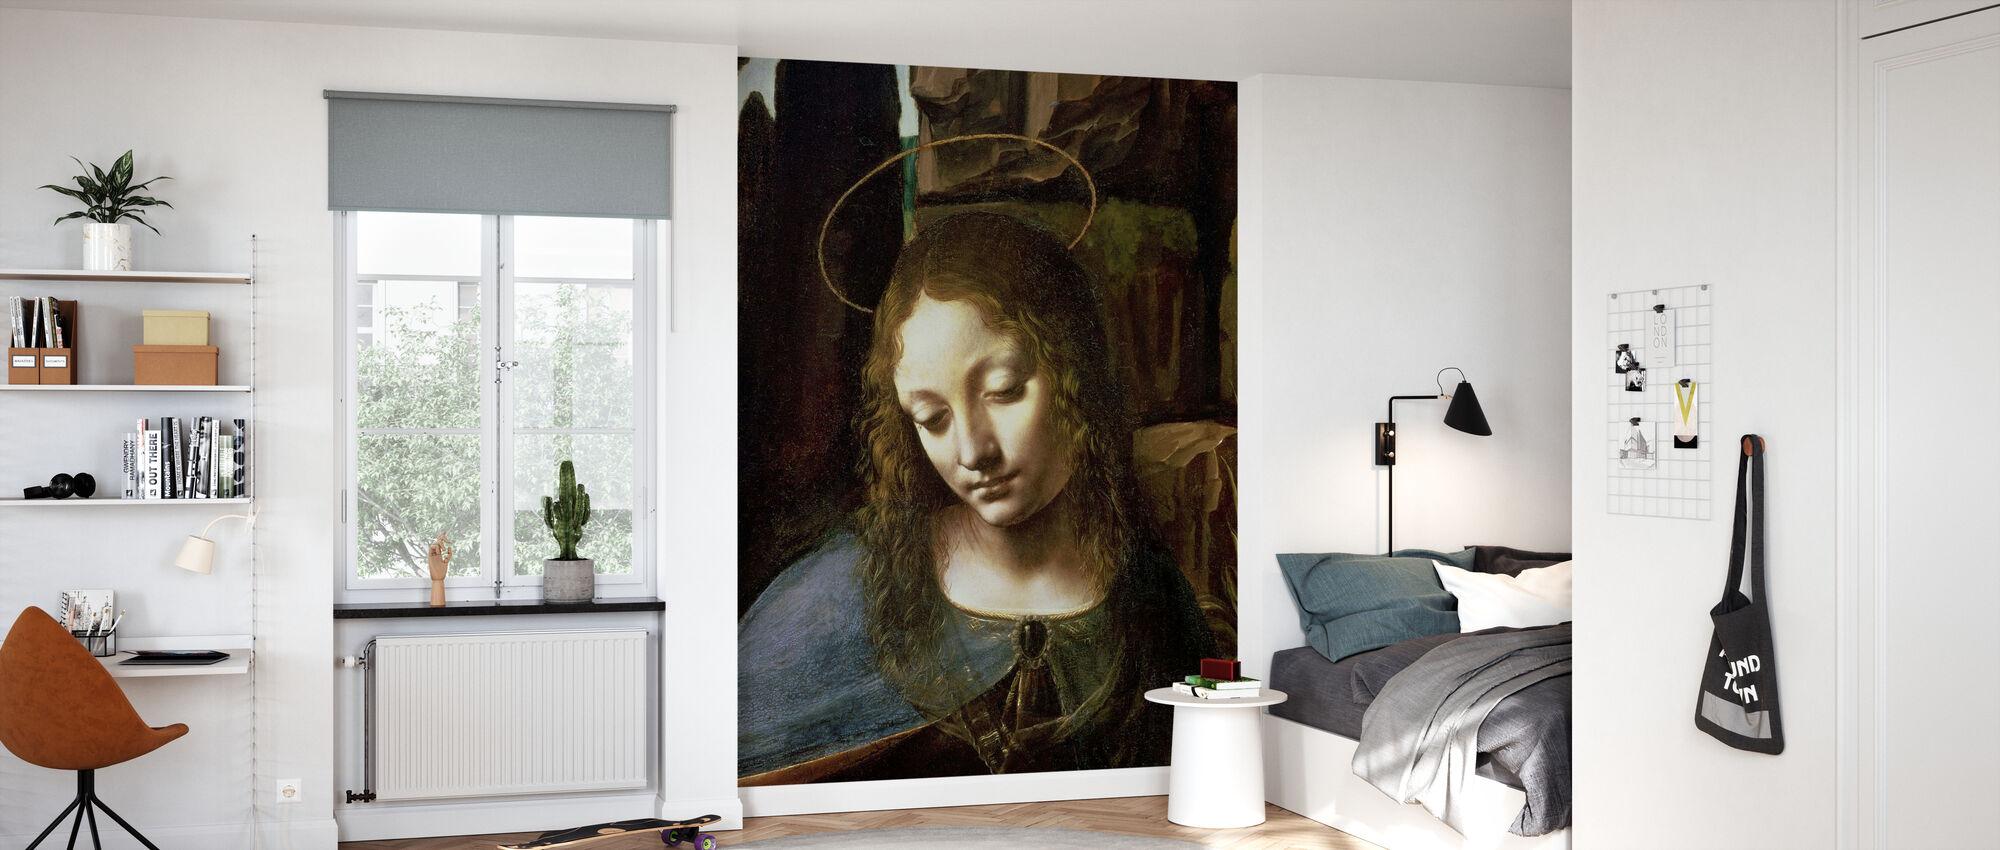 Virgin of the Rocks - Leonardo da Vinci - Wallpaper - Kids Room